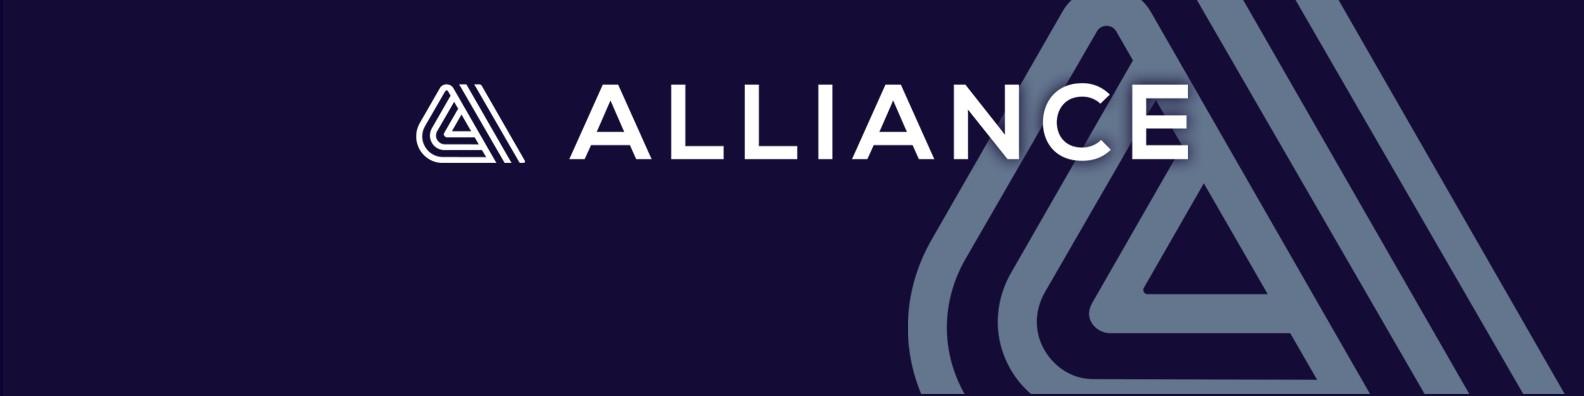 Alliance Family of Companies | LinkedIn